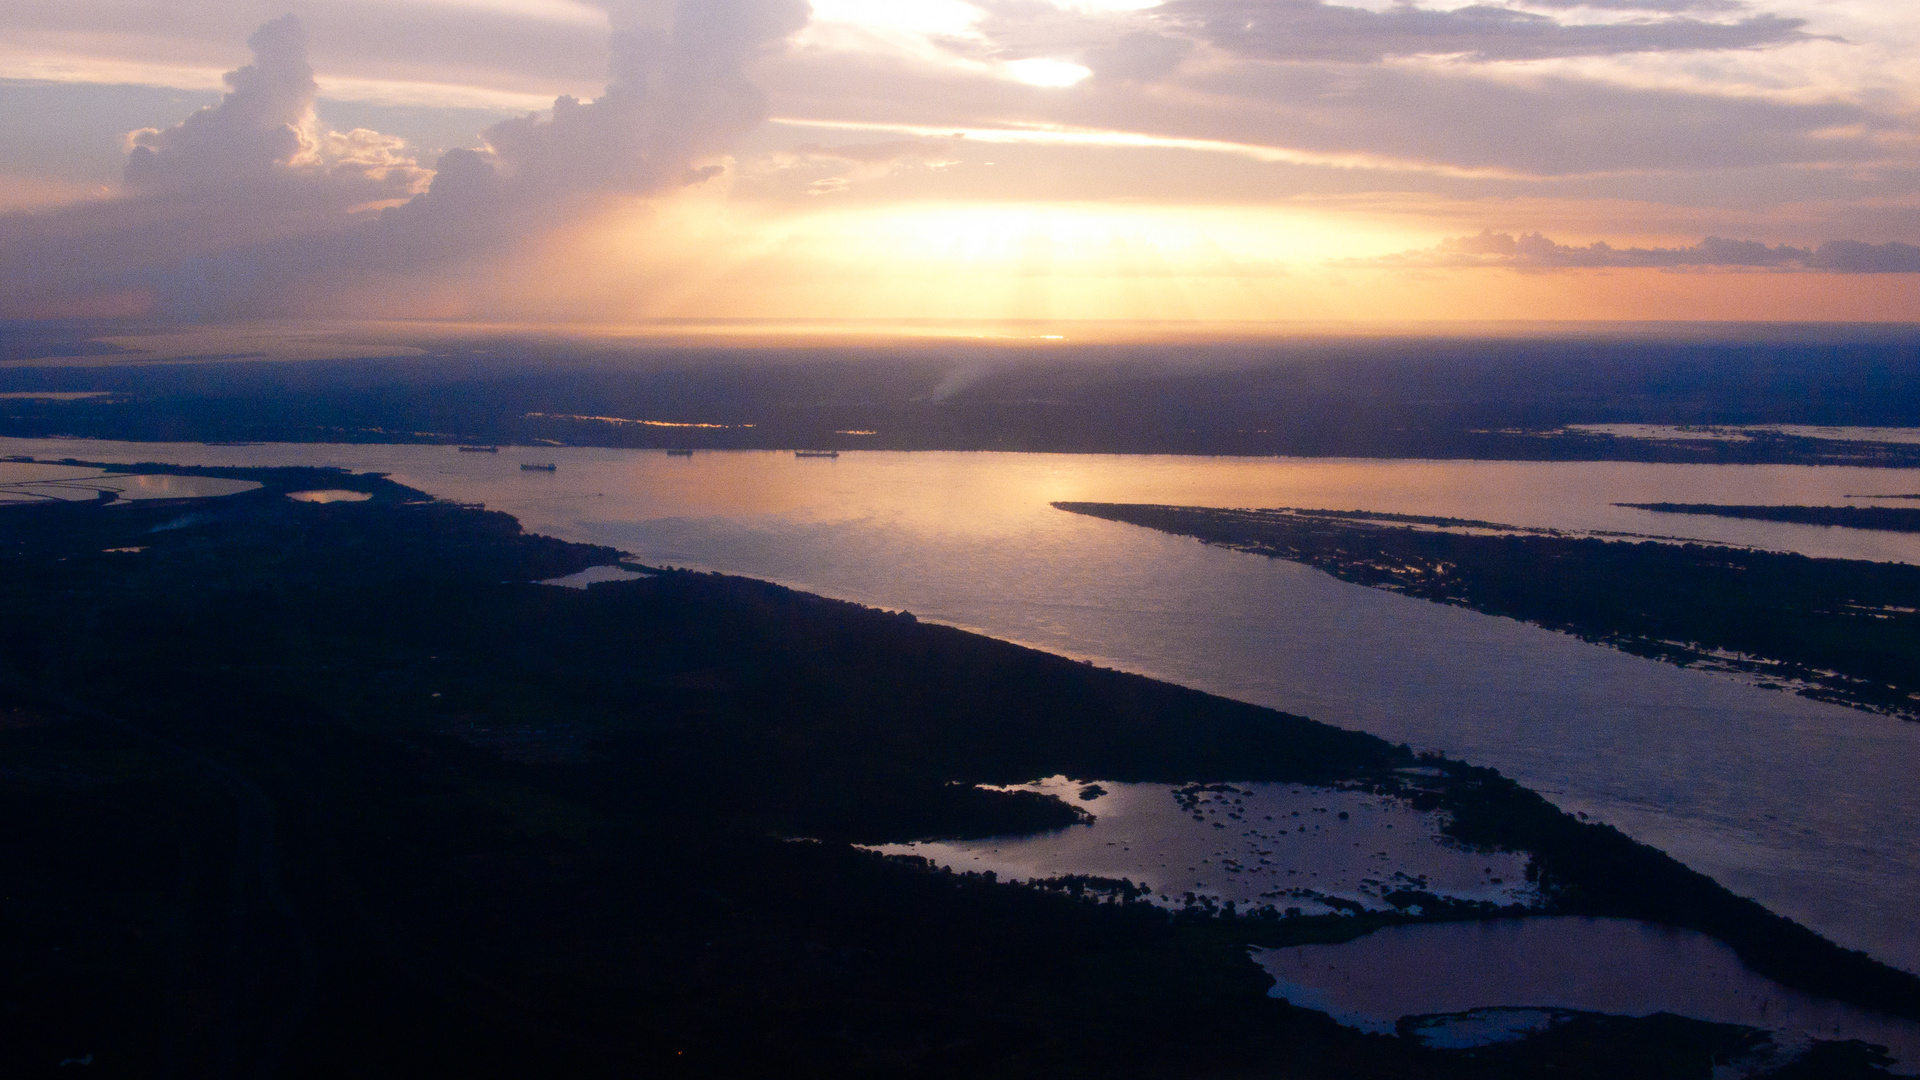 Nuestro Río Orinoco, Pto Ordaz Edo. Bolívar Venezuela.